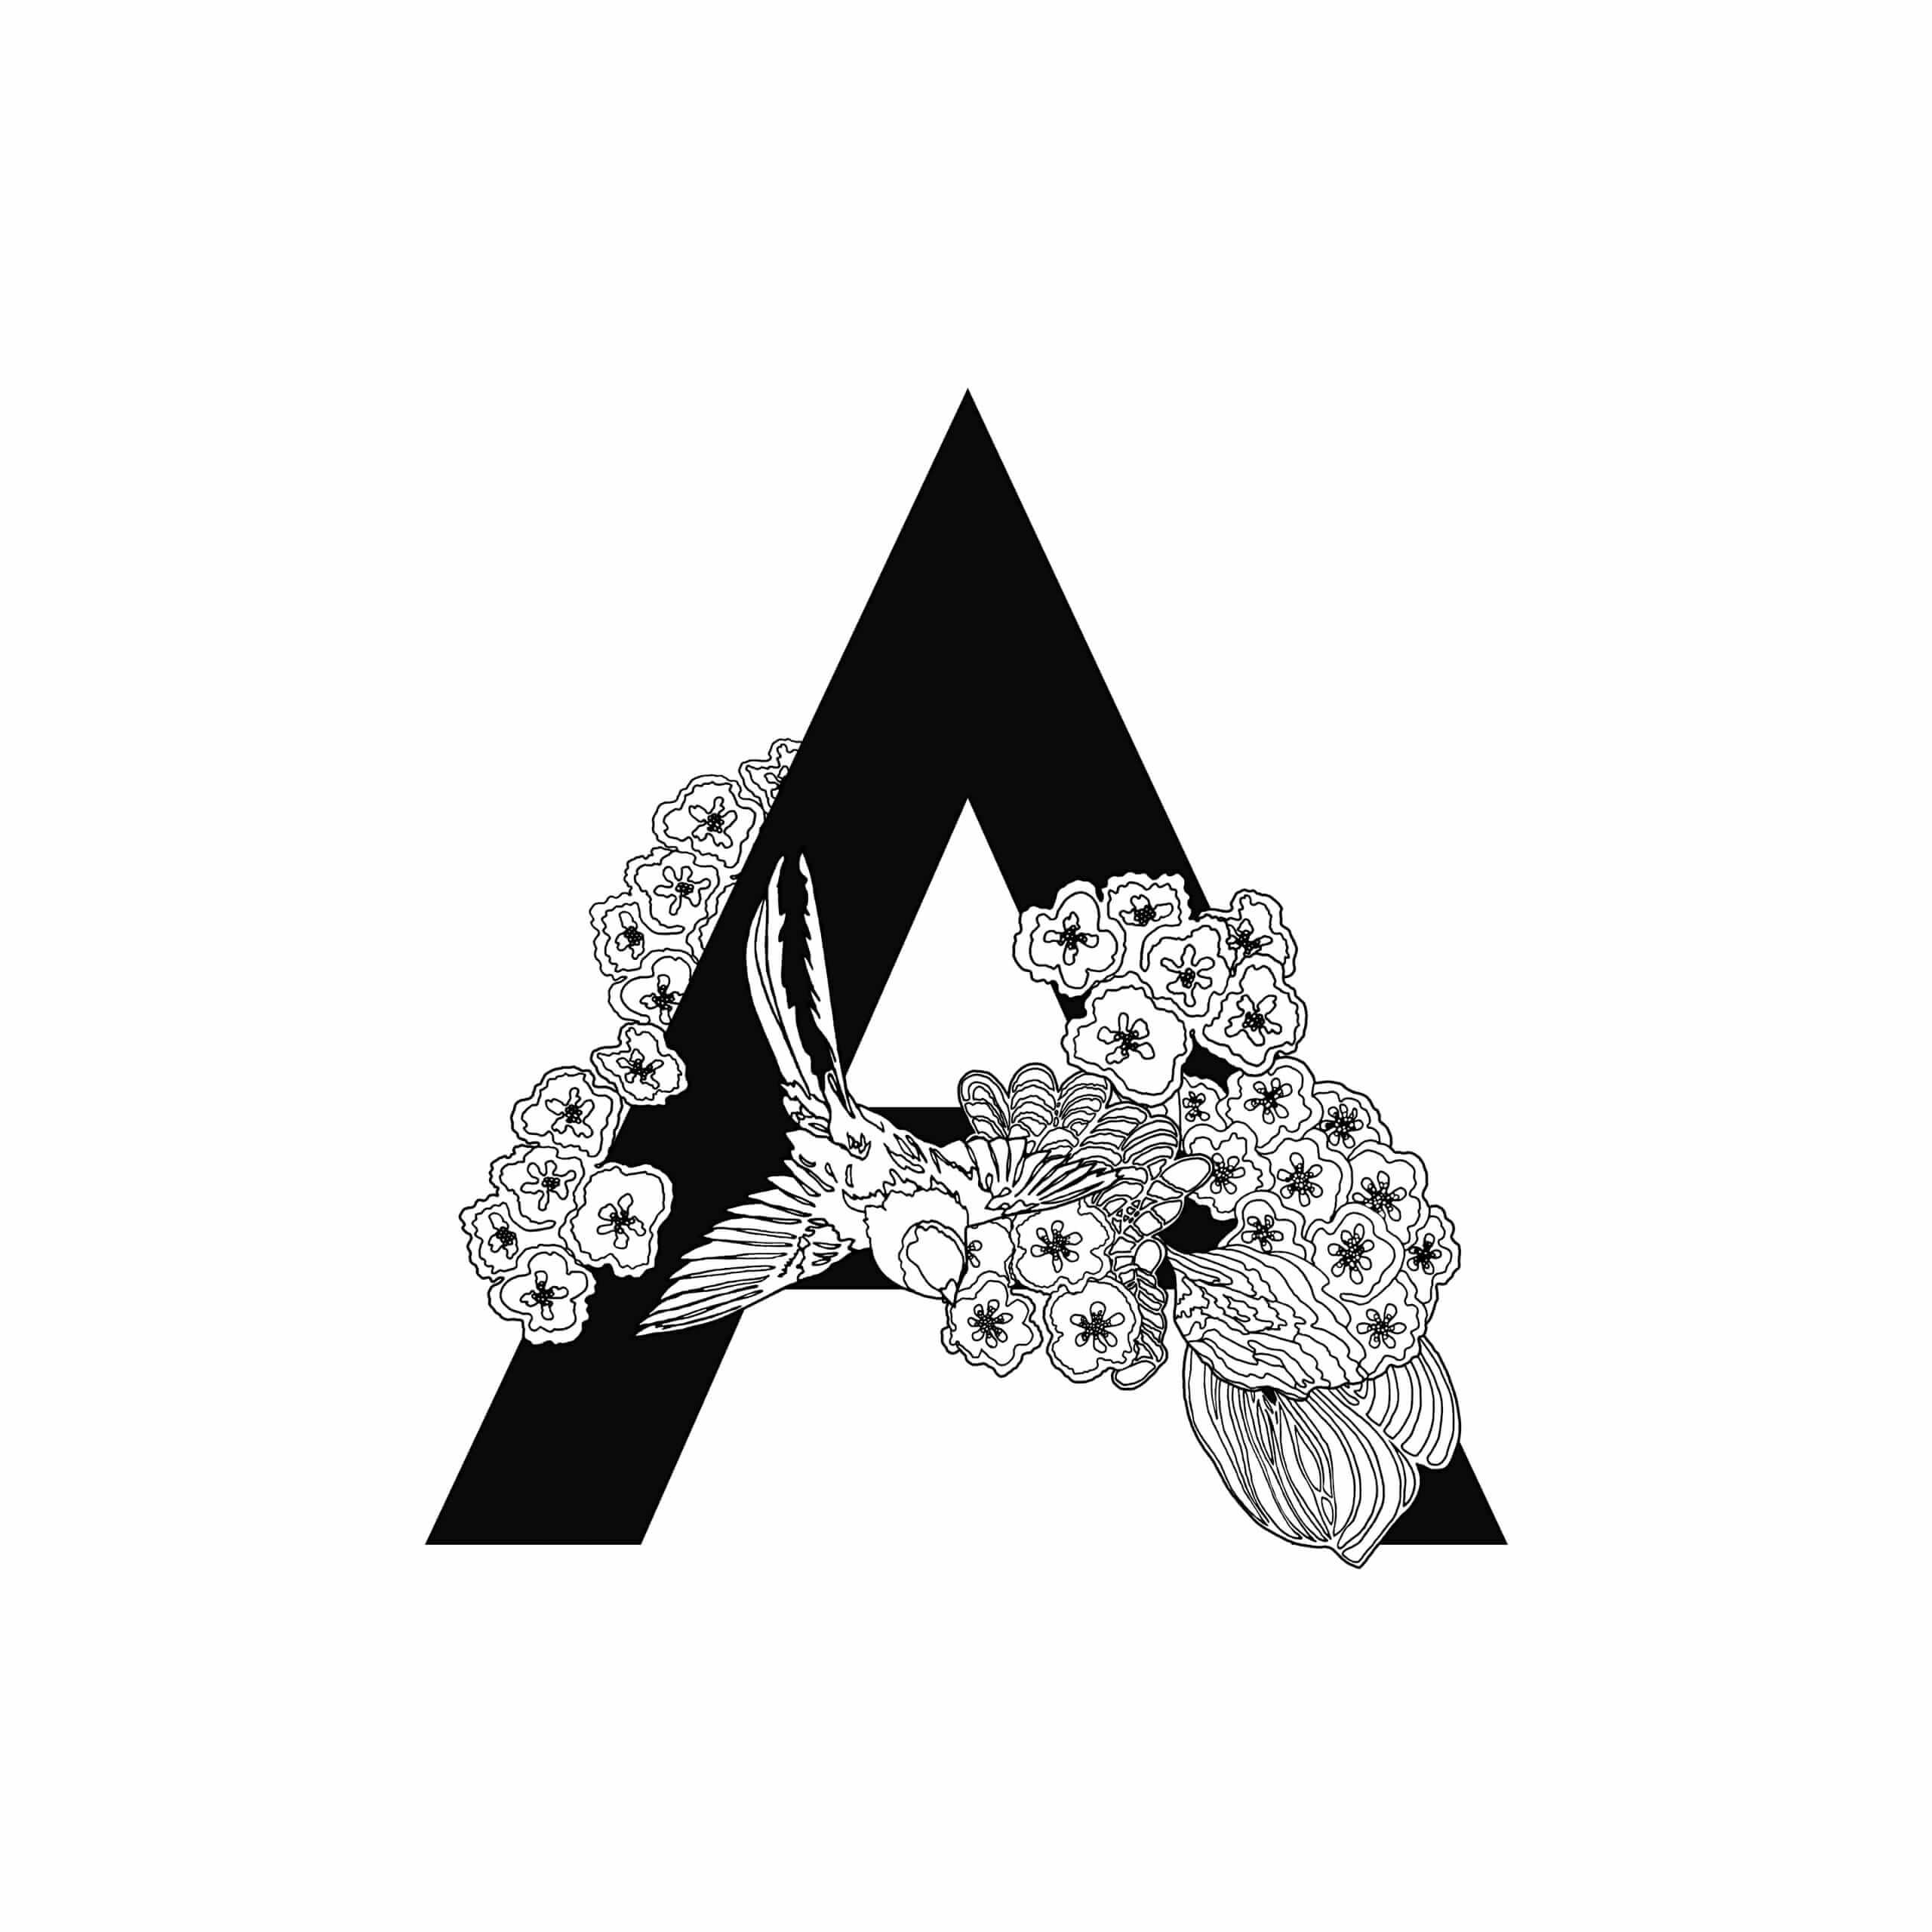 AI_House-Style_Dropcap_LR_2